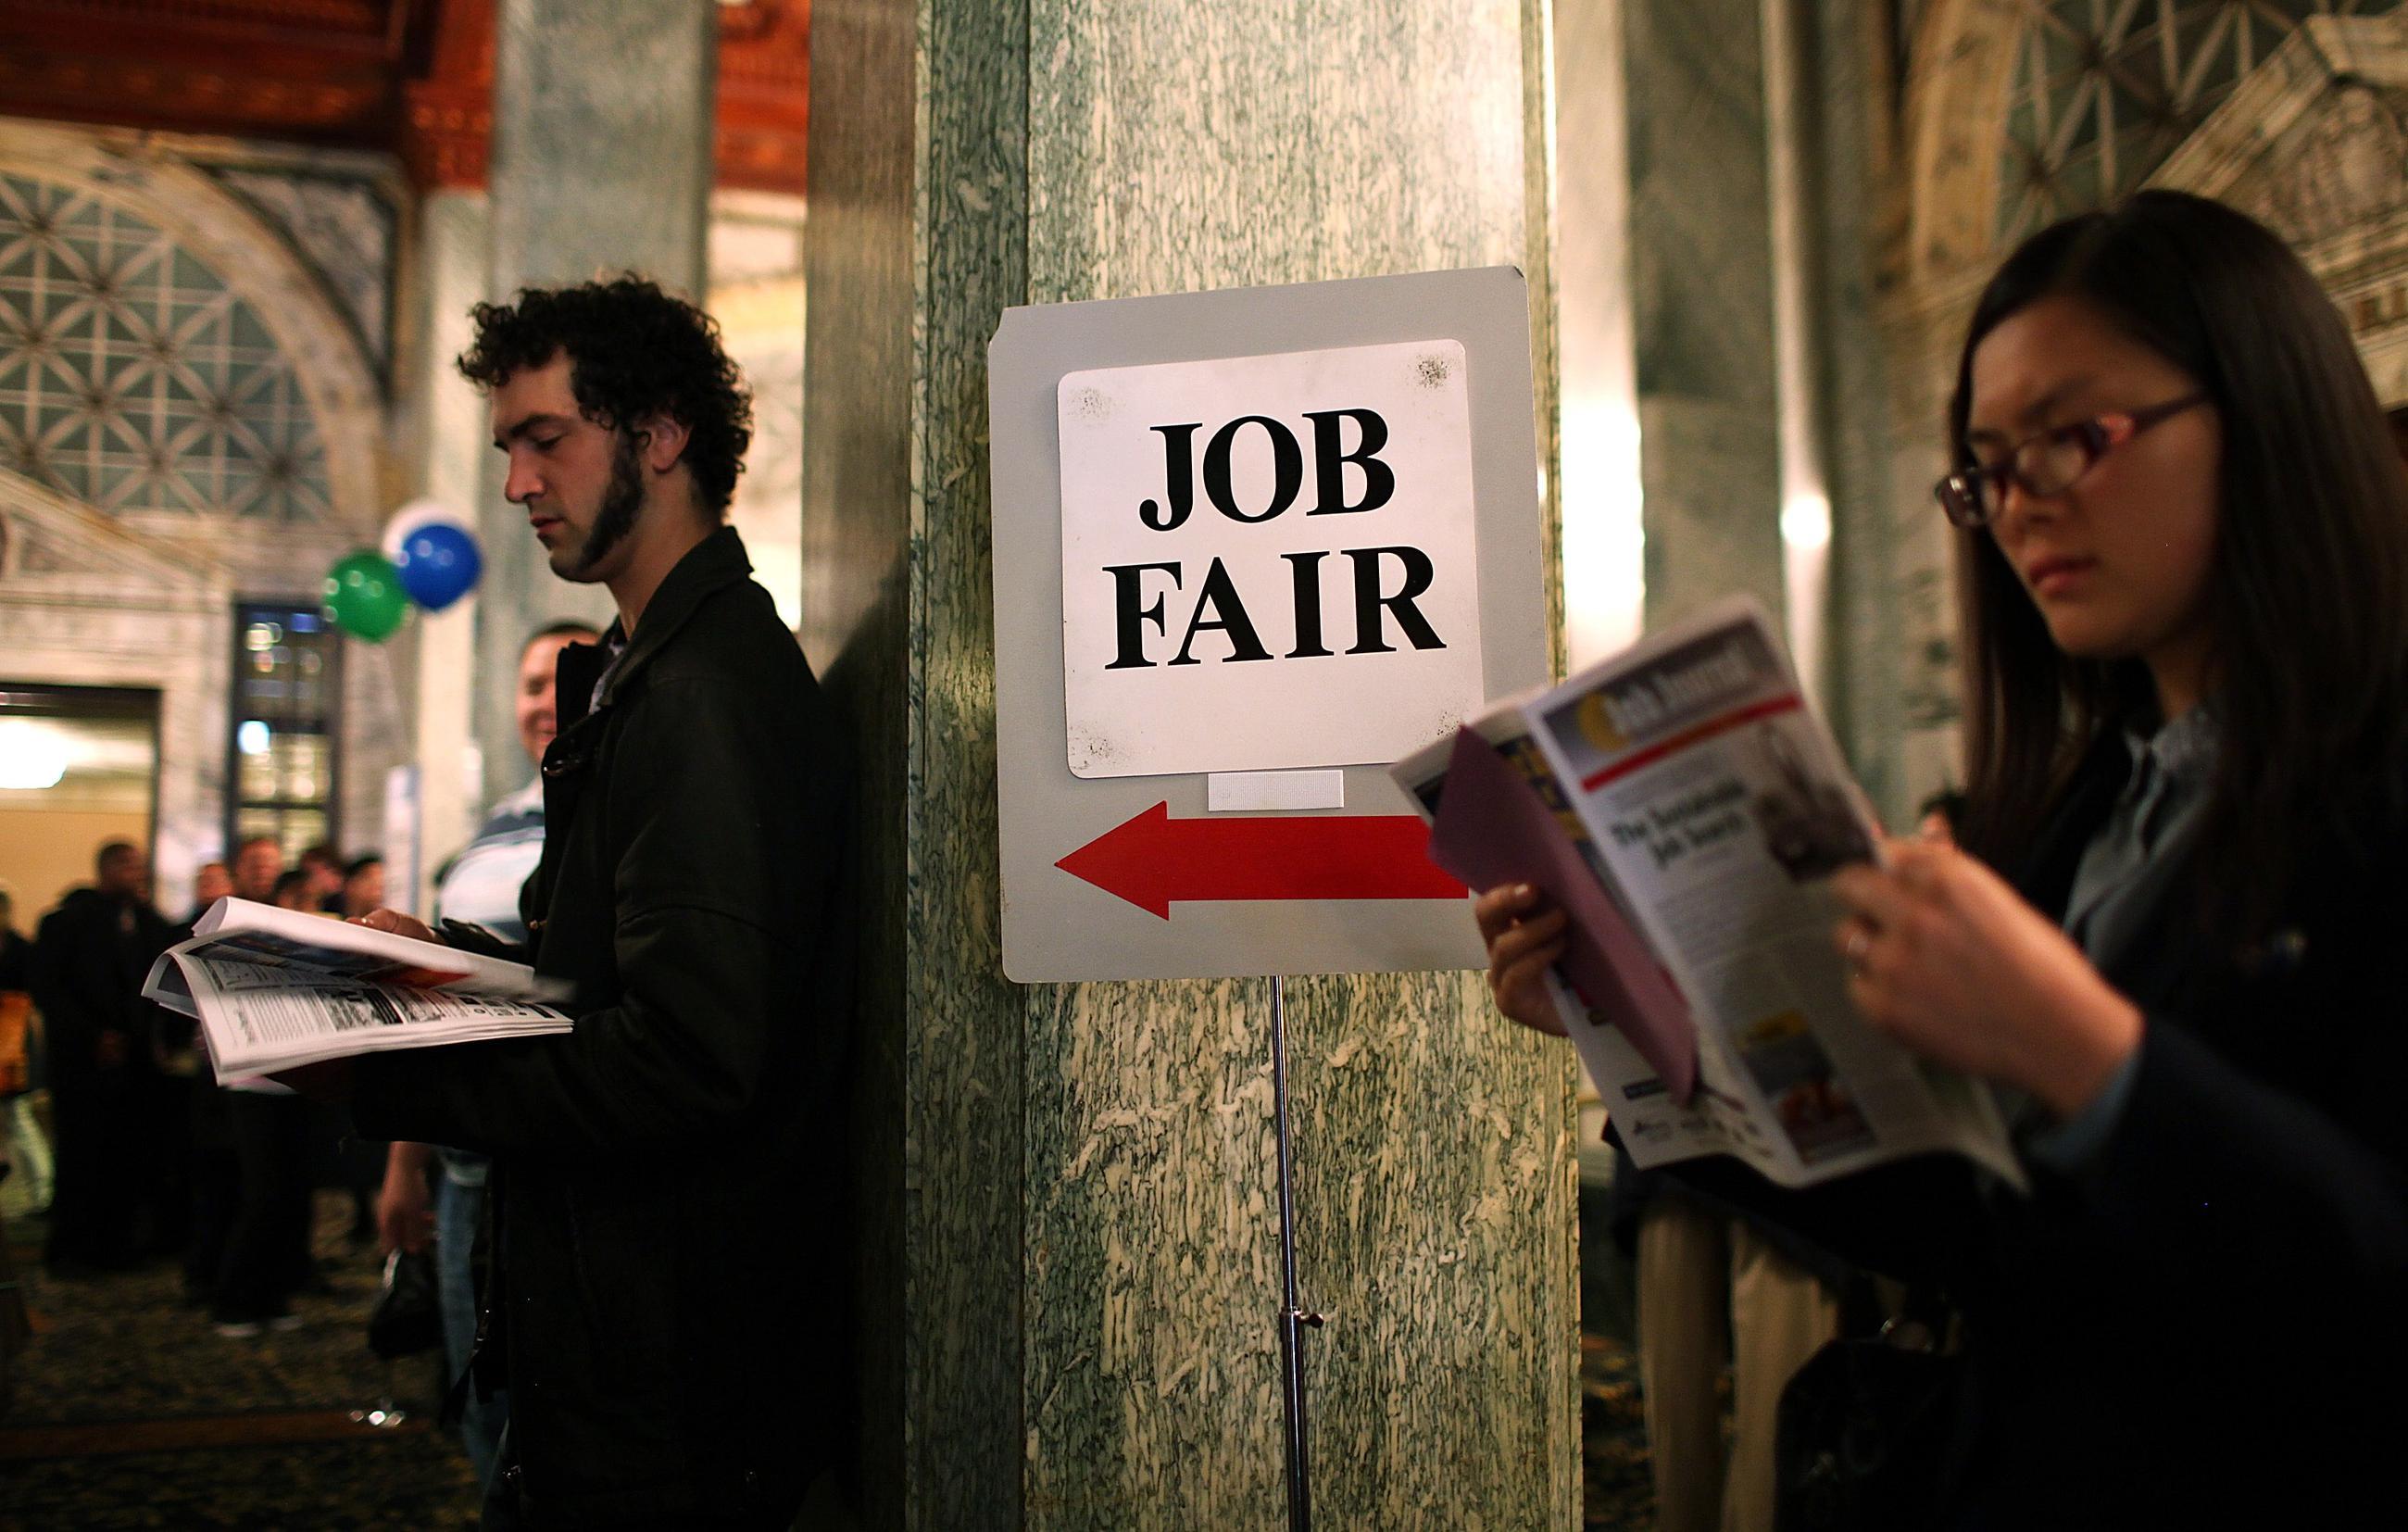 The Senate Has a Deal on Unemployment Insurance